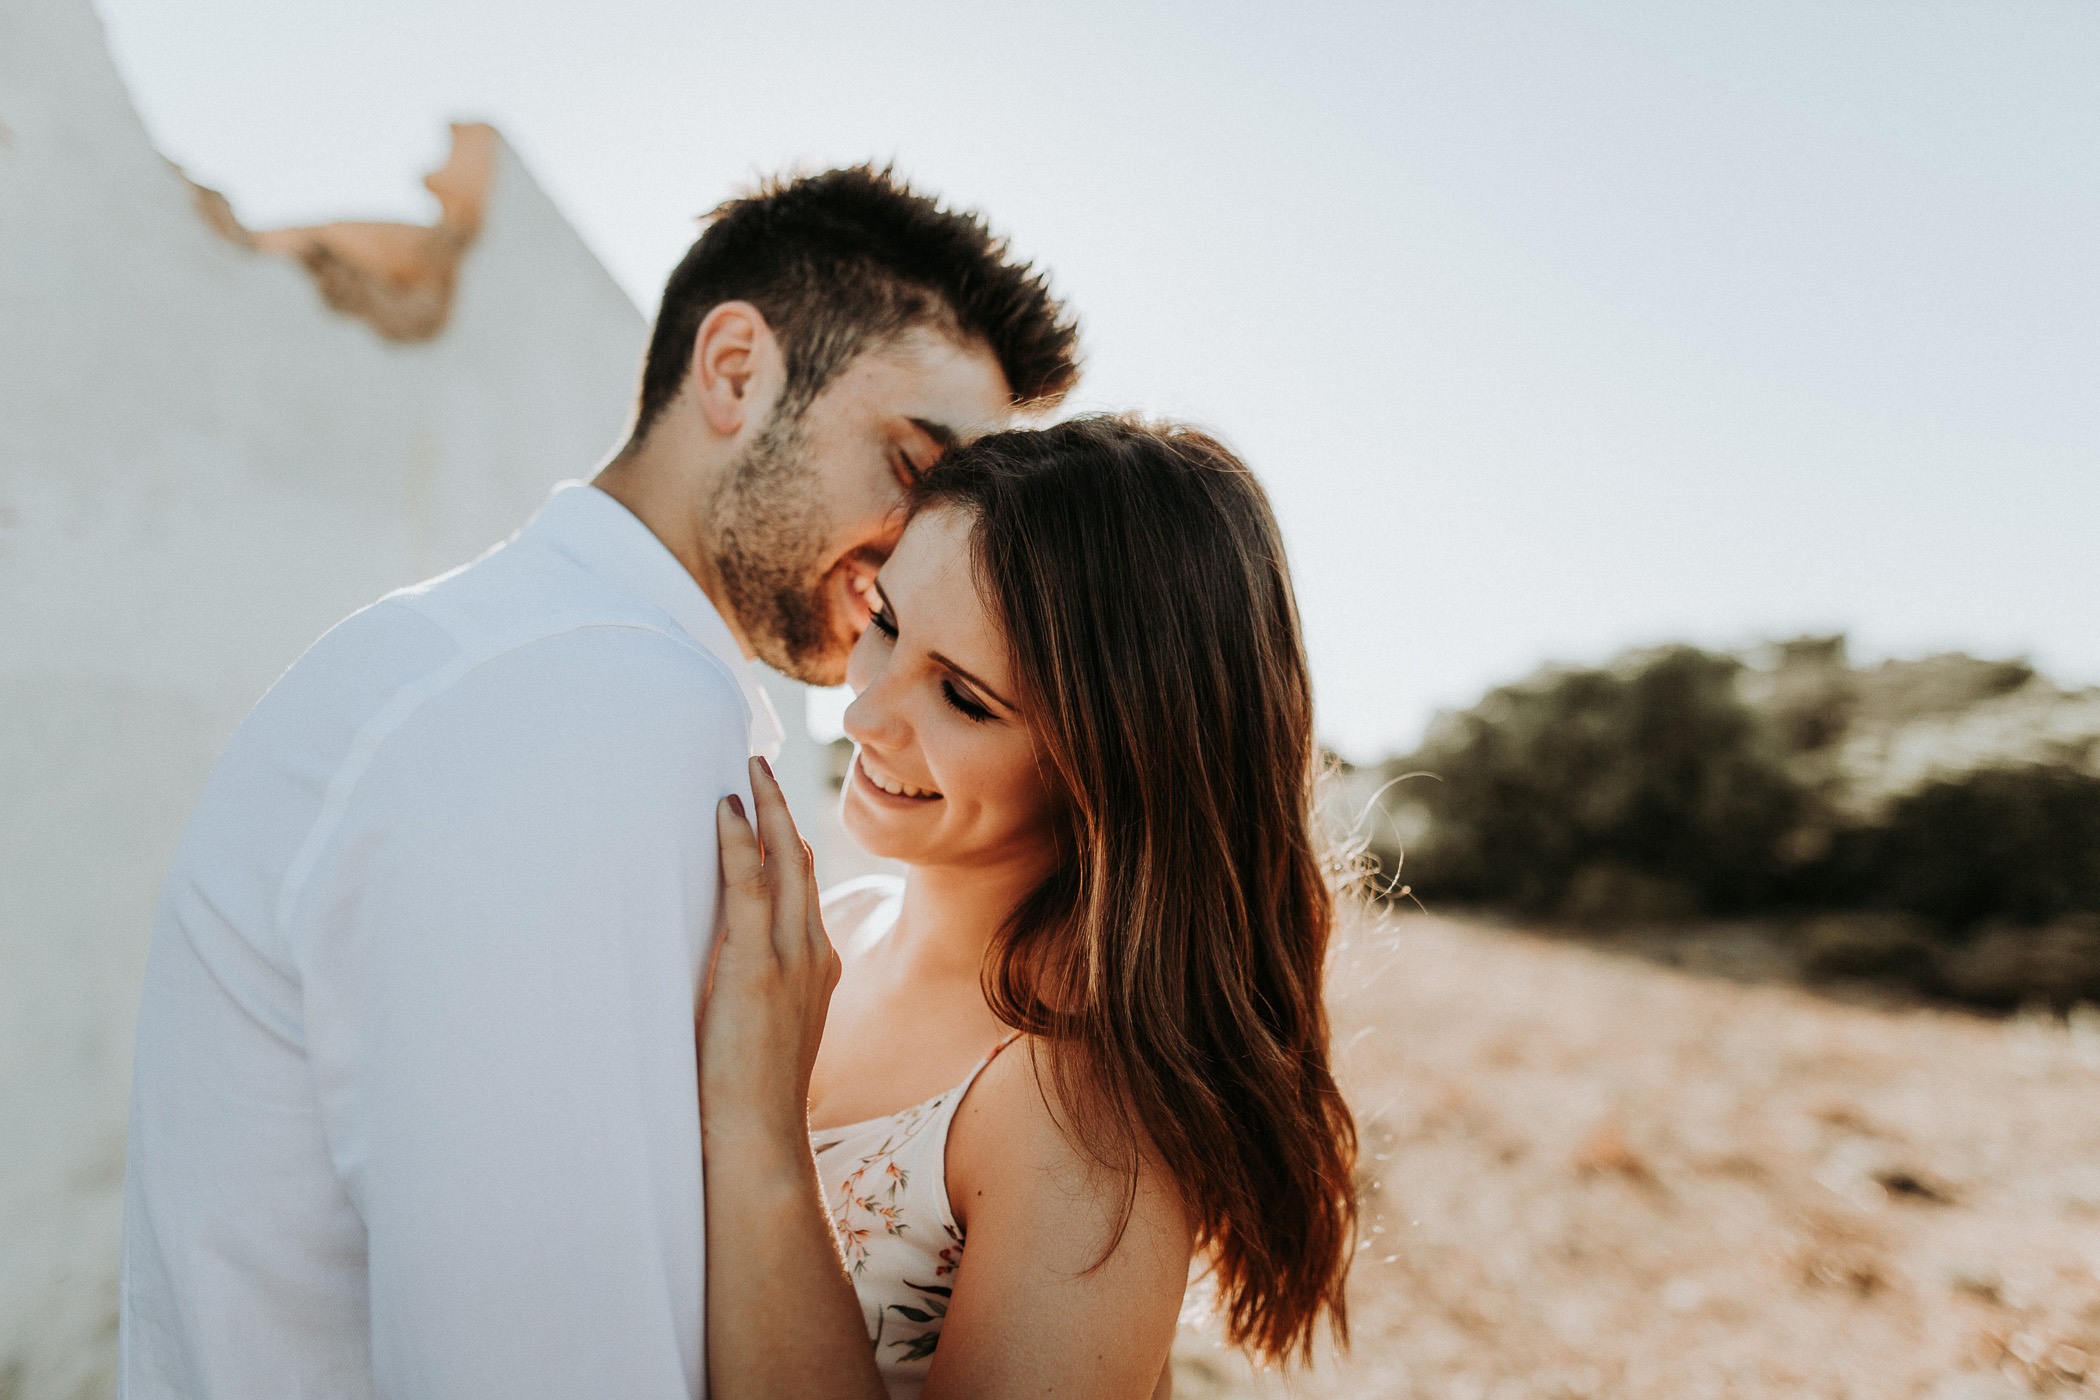 DanielaMarquardtPhotography_wedding_elopement_mallorca_spain_calapi_palma_lauraandtoni_371